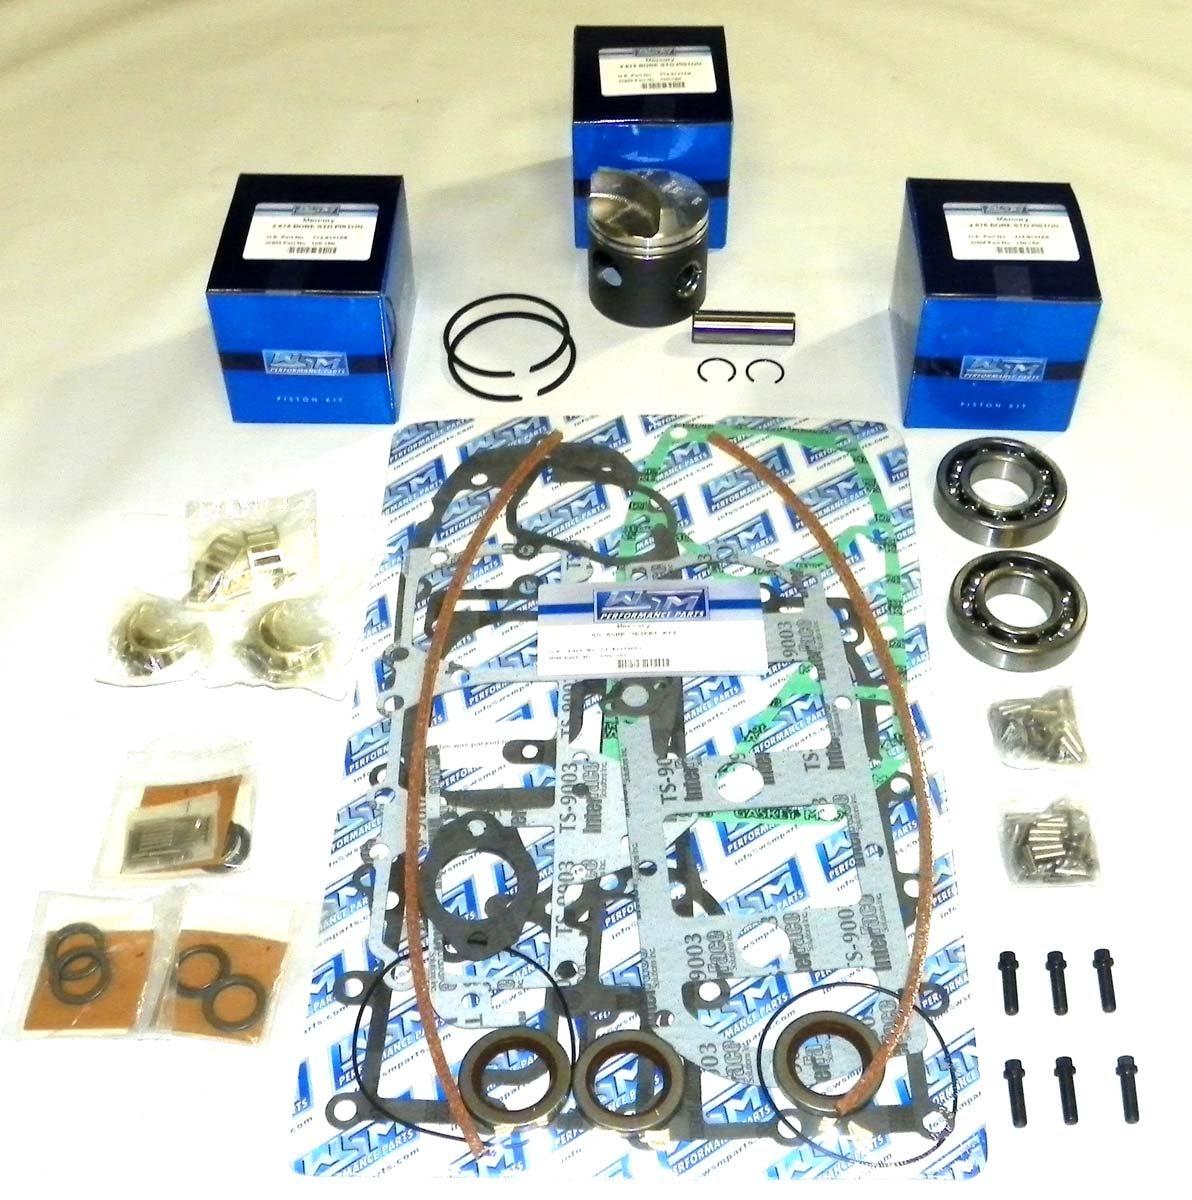 Mercury 50 & 60 Hp 1984-1990, 70 Hp 1977-1983 3 Cylinder Power Head Rebuild Kit PWC 100-15-10 OEM Piston # 774-8600A 3, 774 9137A 9 9 (STD (2.875''))